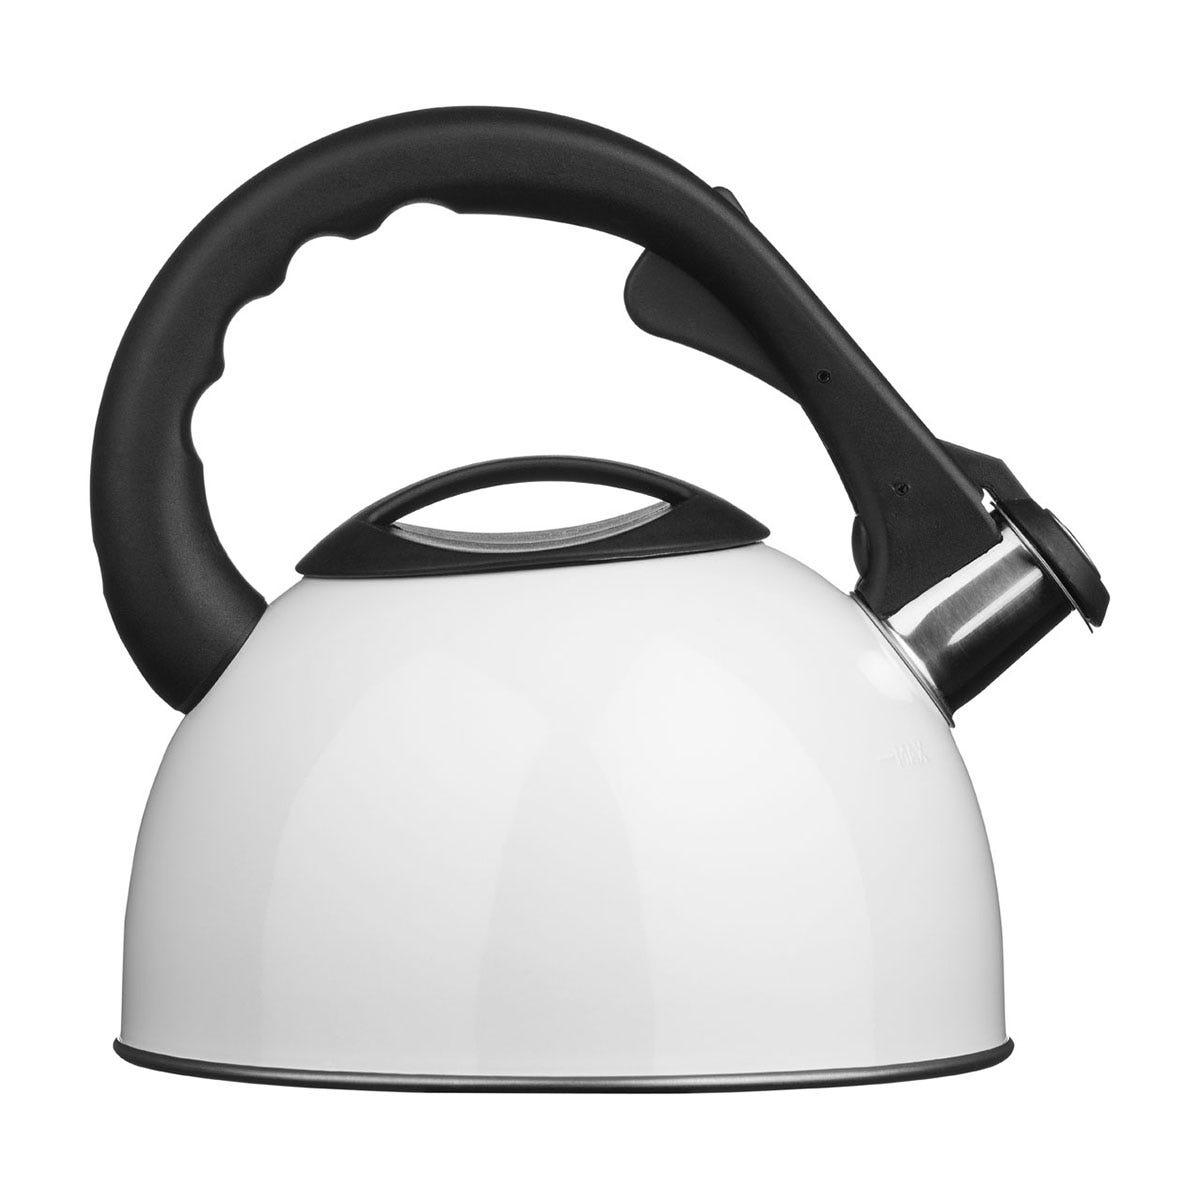 Premier Housewares 2.5L Stainless Steel Whistling Kettle - White